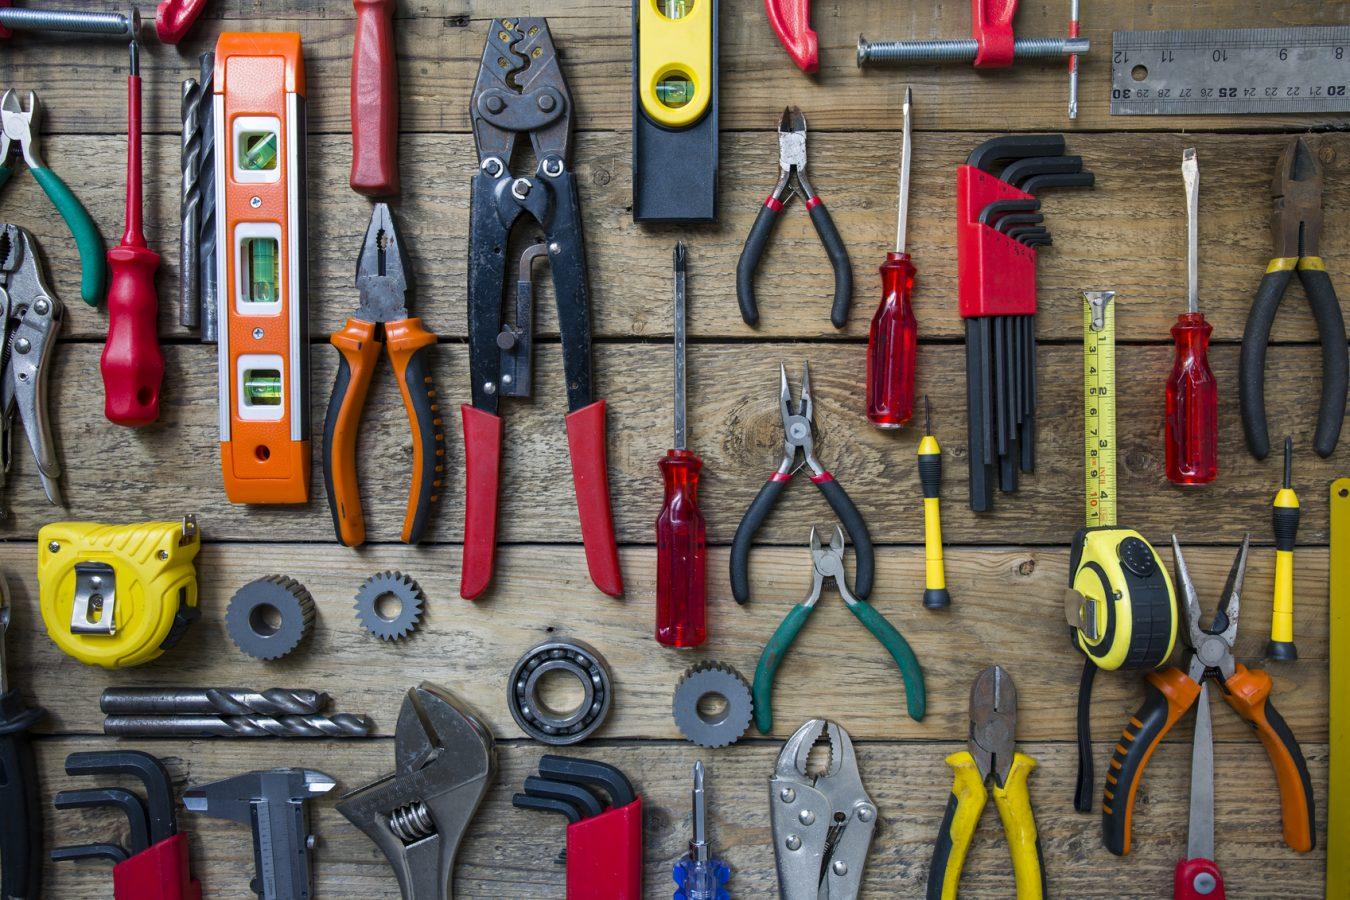 Plumbing Tools List - Best Toolset